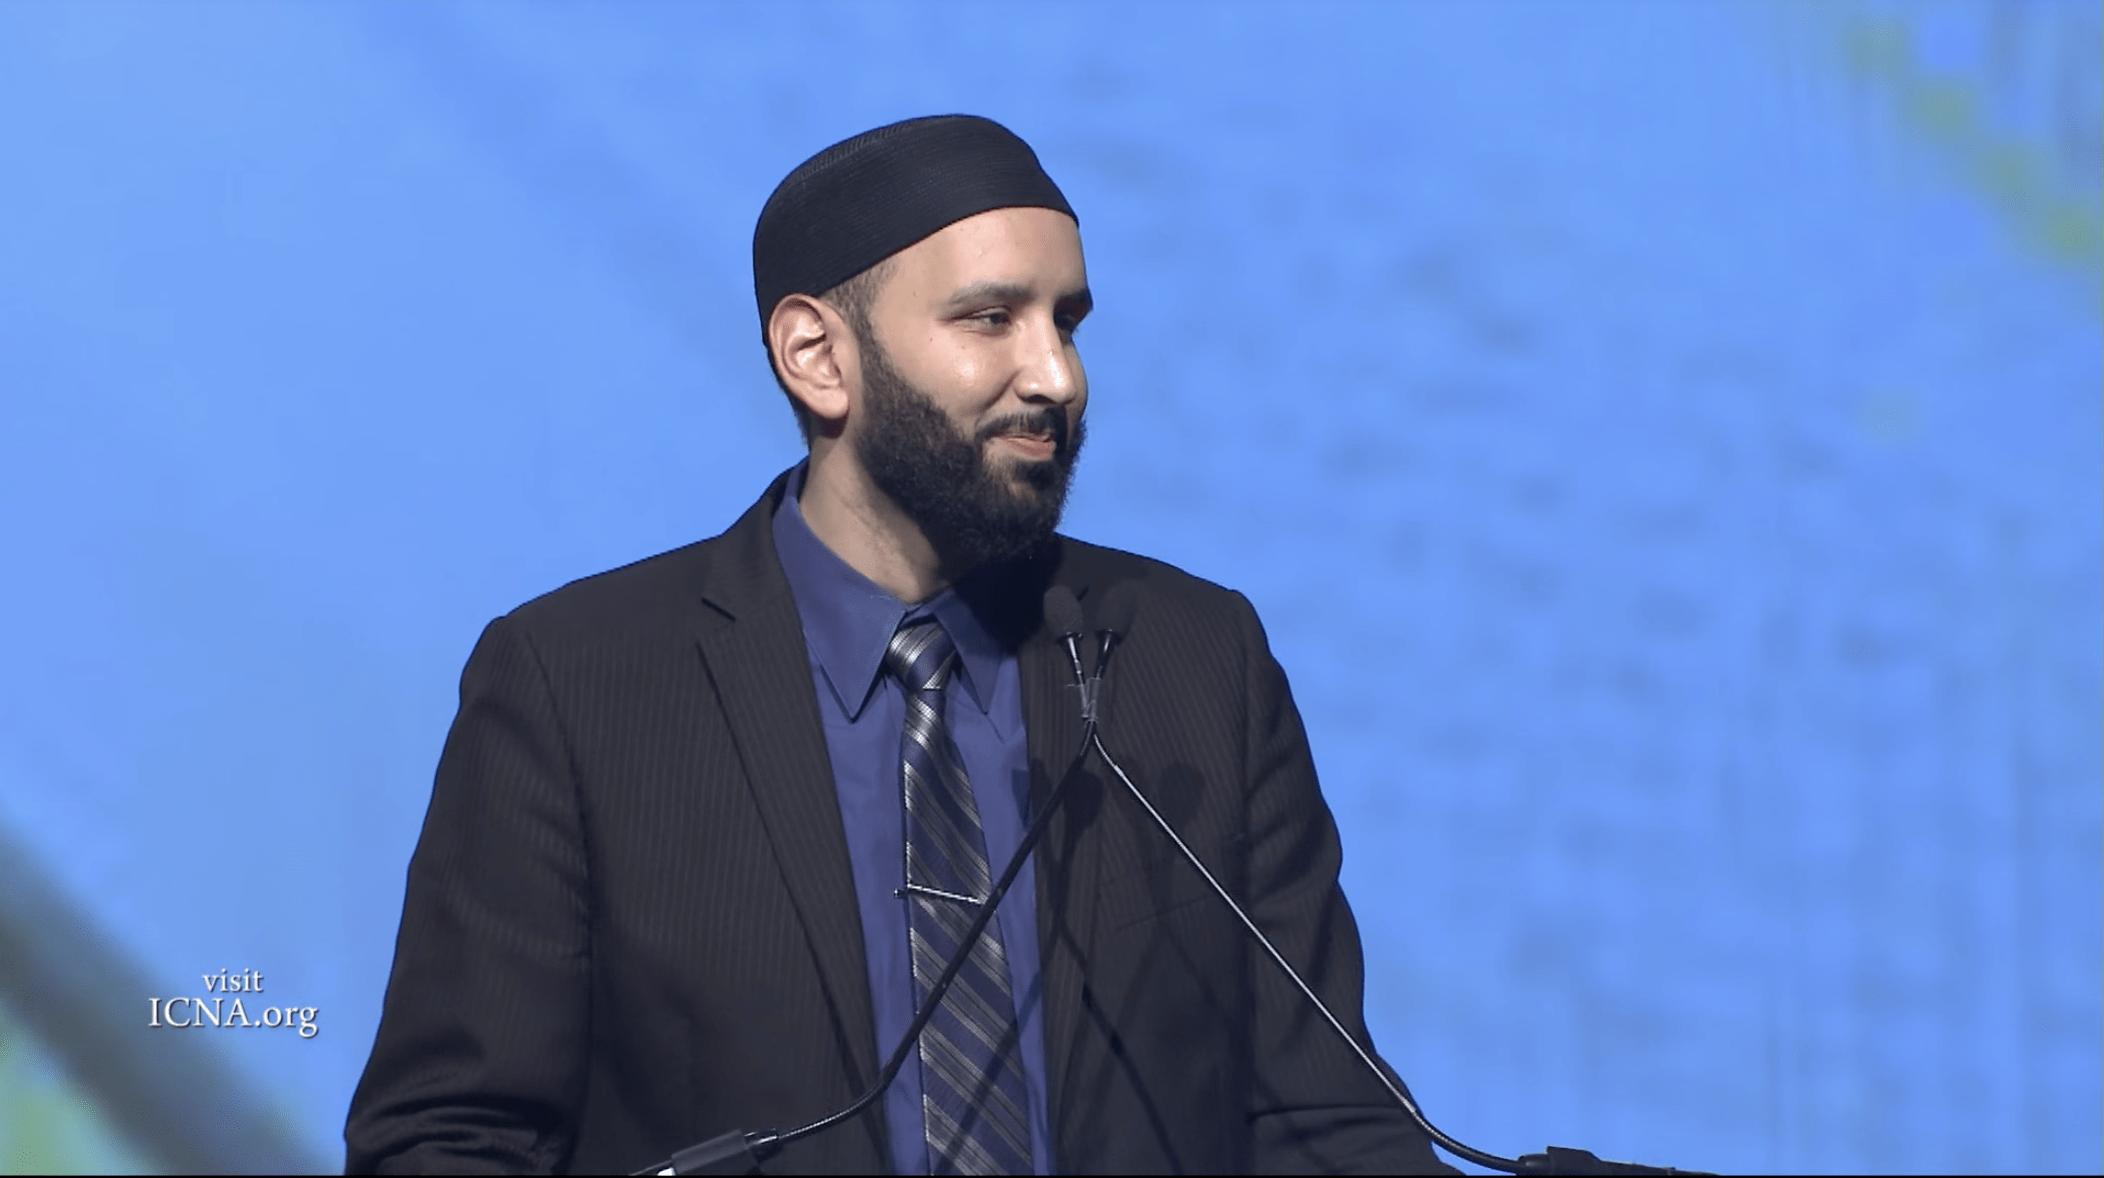 Omar Suleiman – Quran and Islamophobia